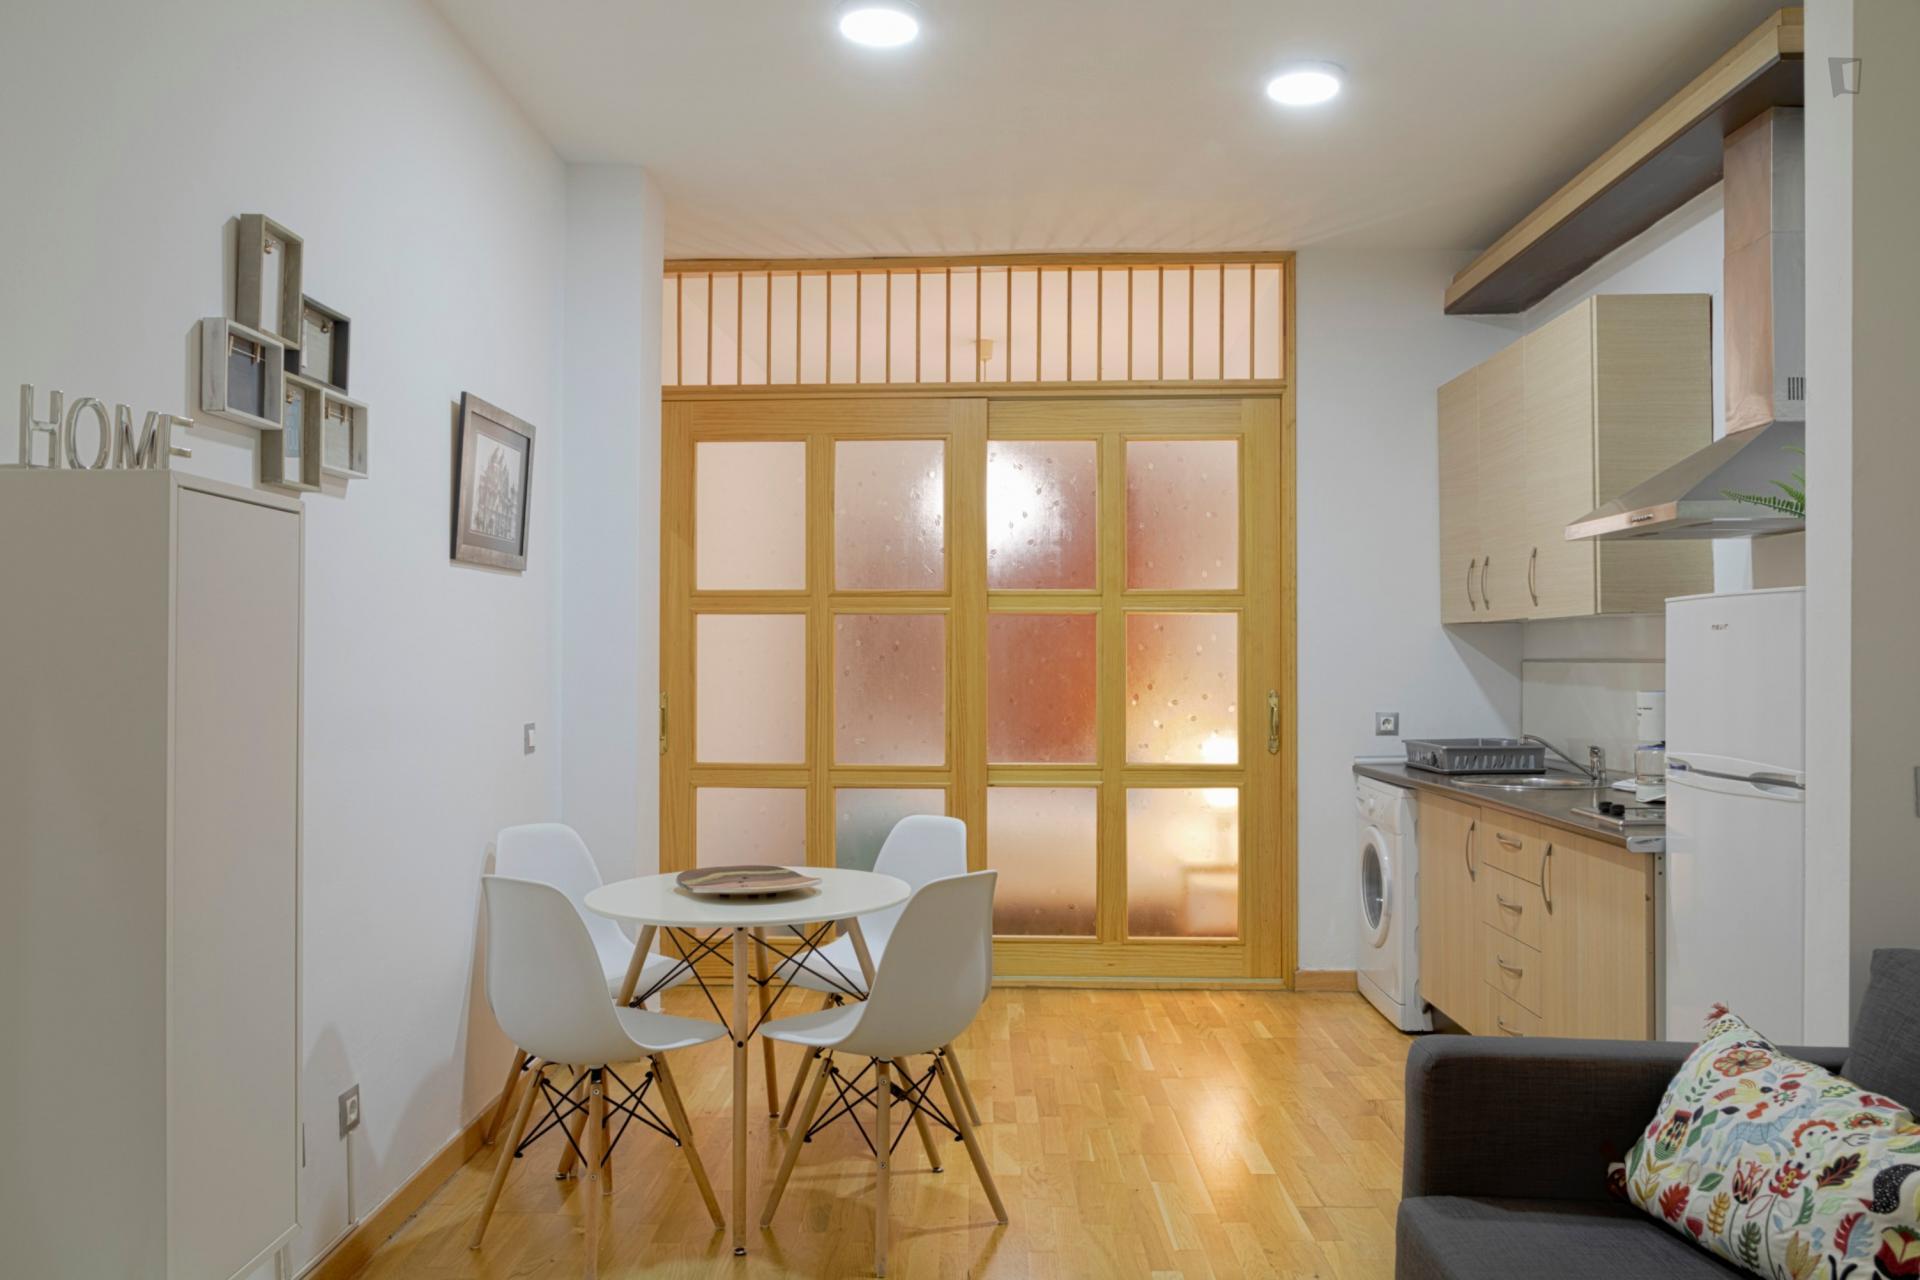 Jinetes- Classy 1 bedroom apartment in Malaga